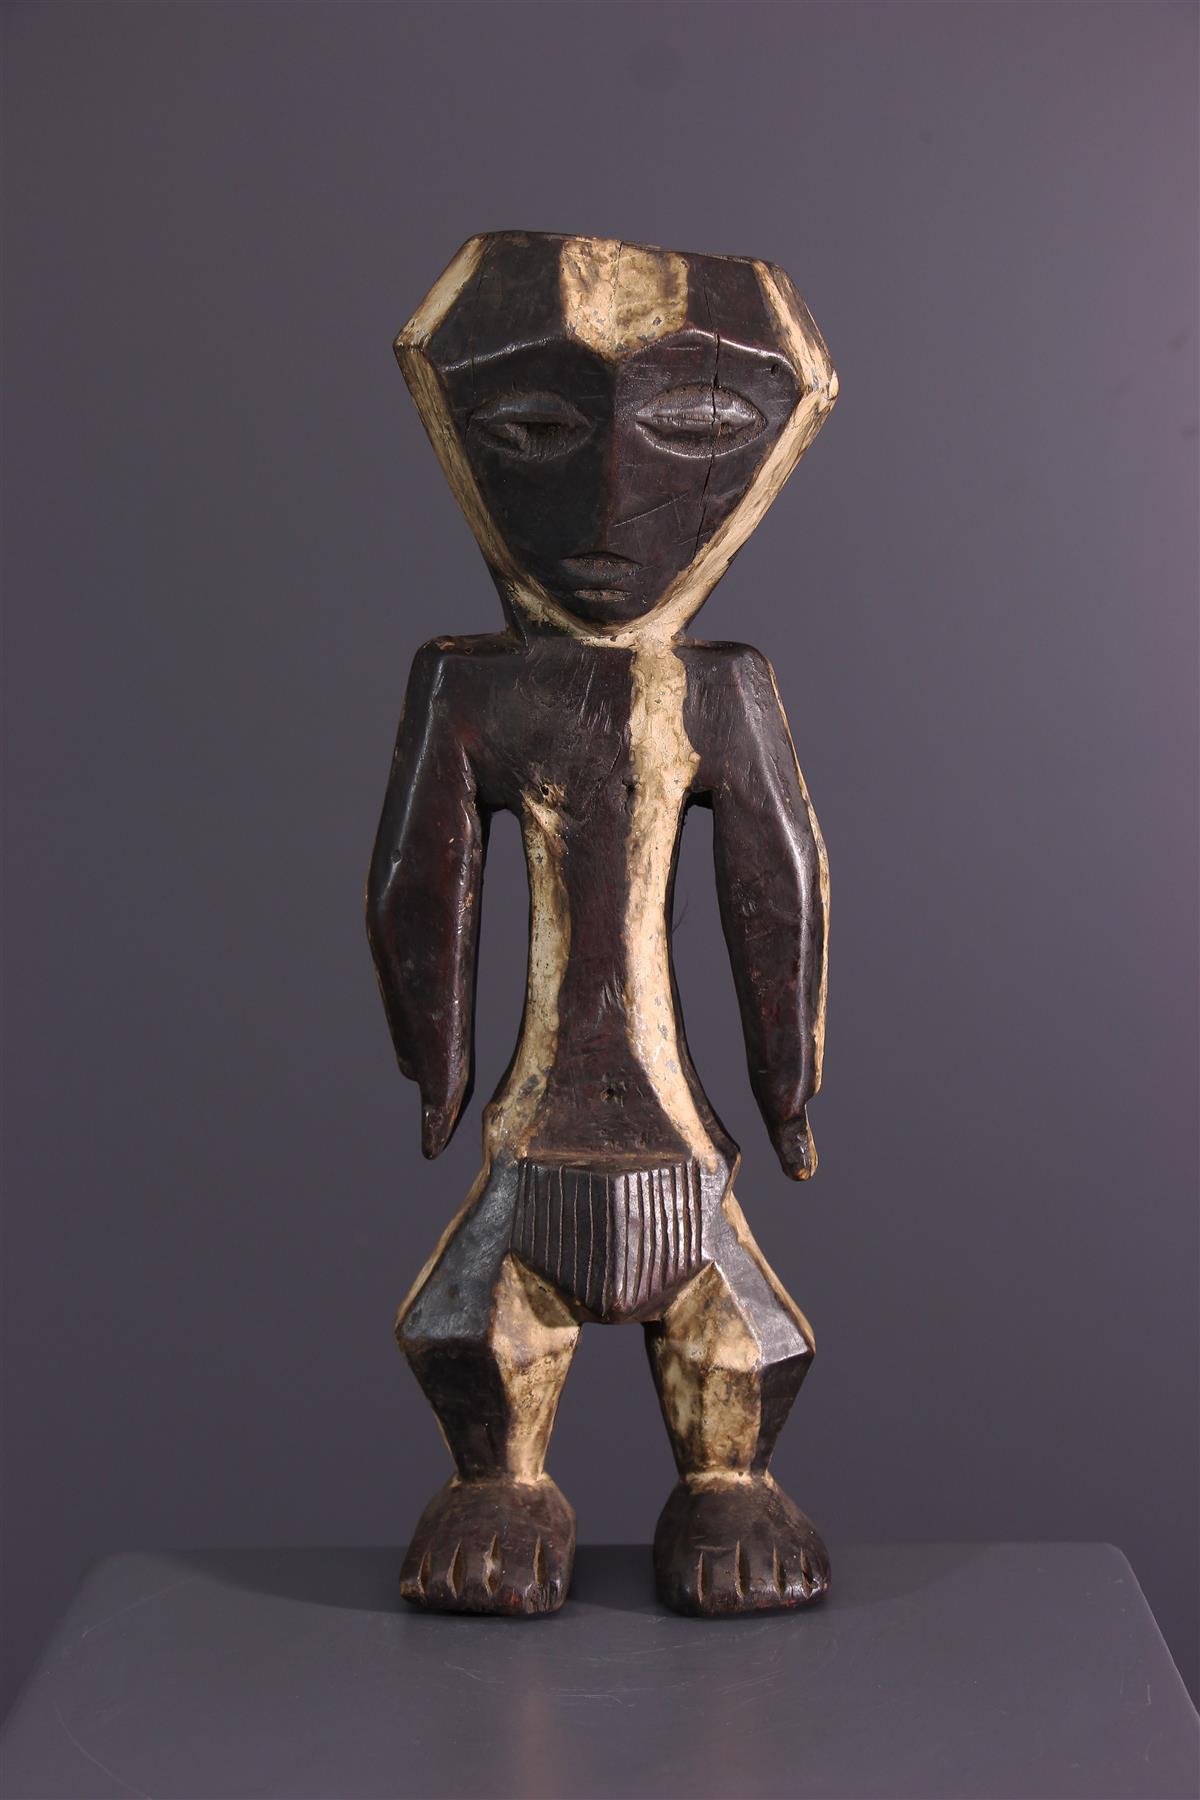 Yela beeldje - Afrikaanse kunst